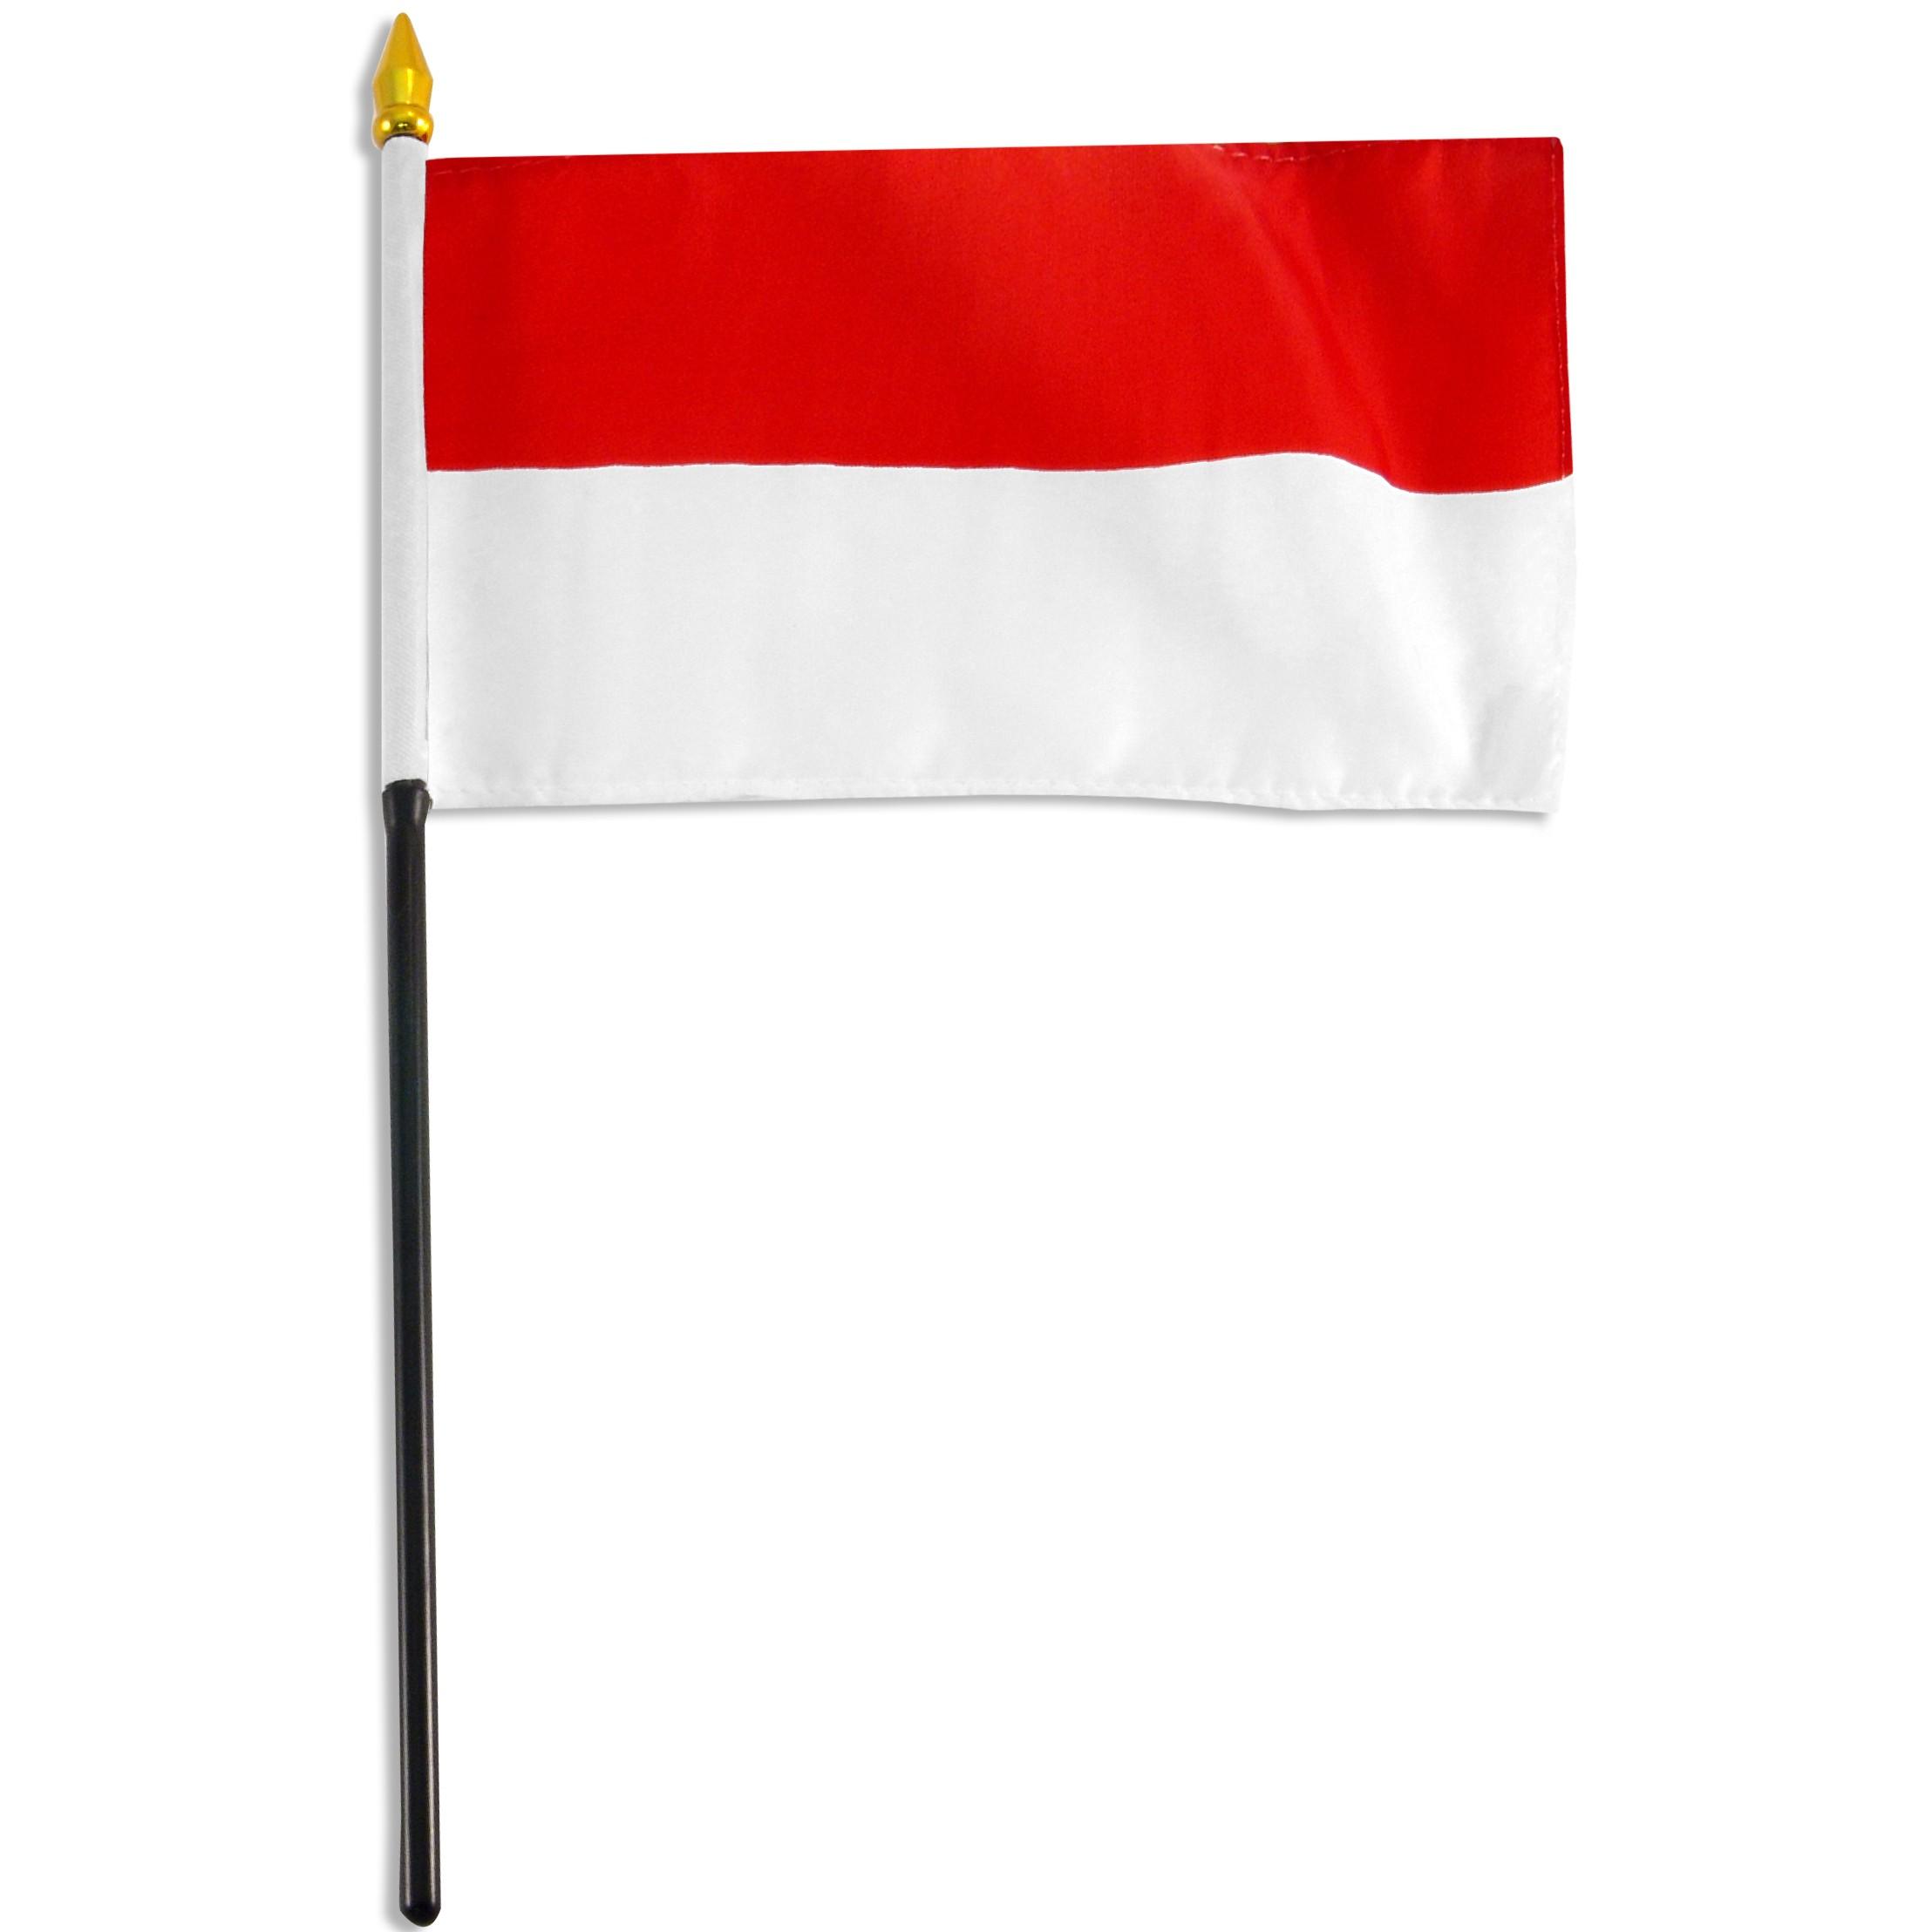 Bendera indonesia clipart banner transparent download Flag of indonesia clipart - ClipartFest banner transparent download